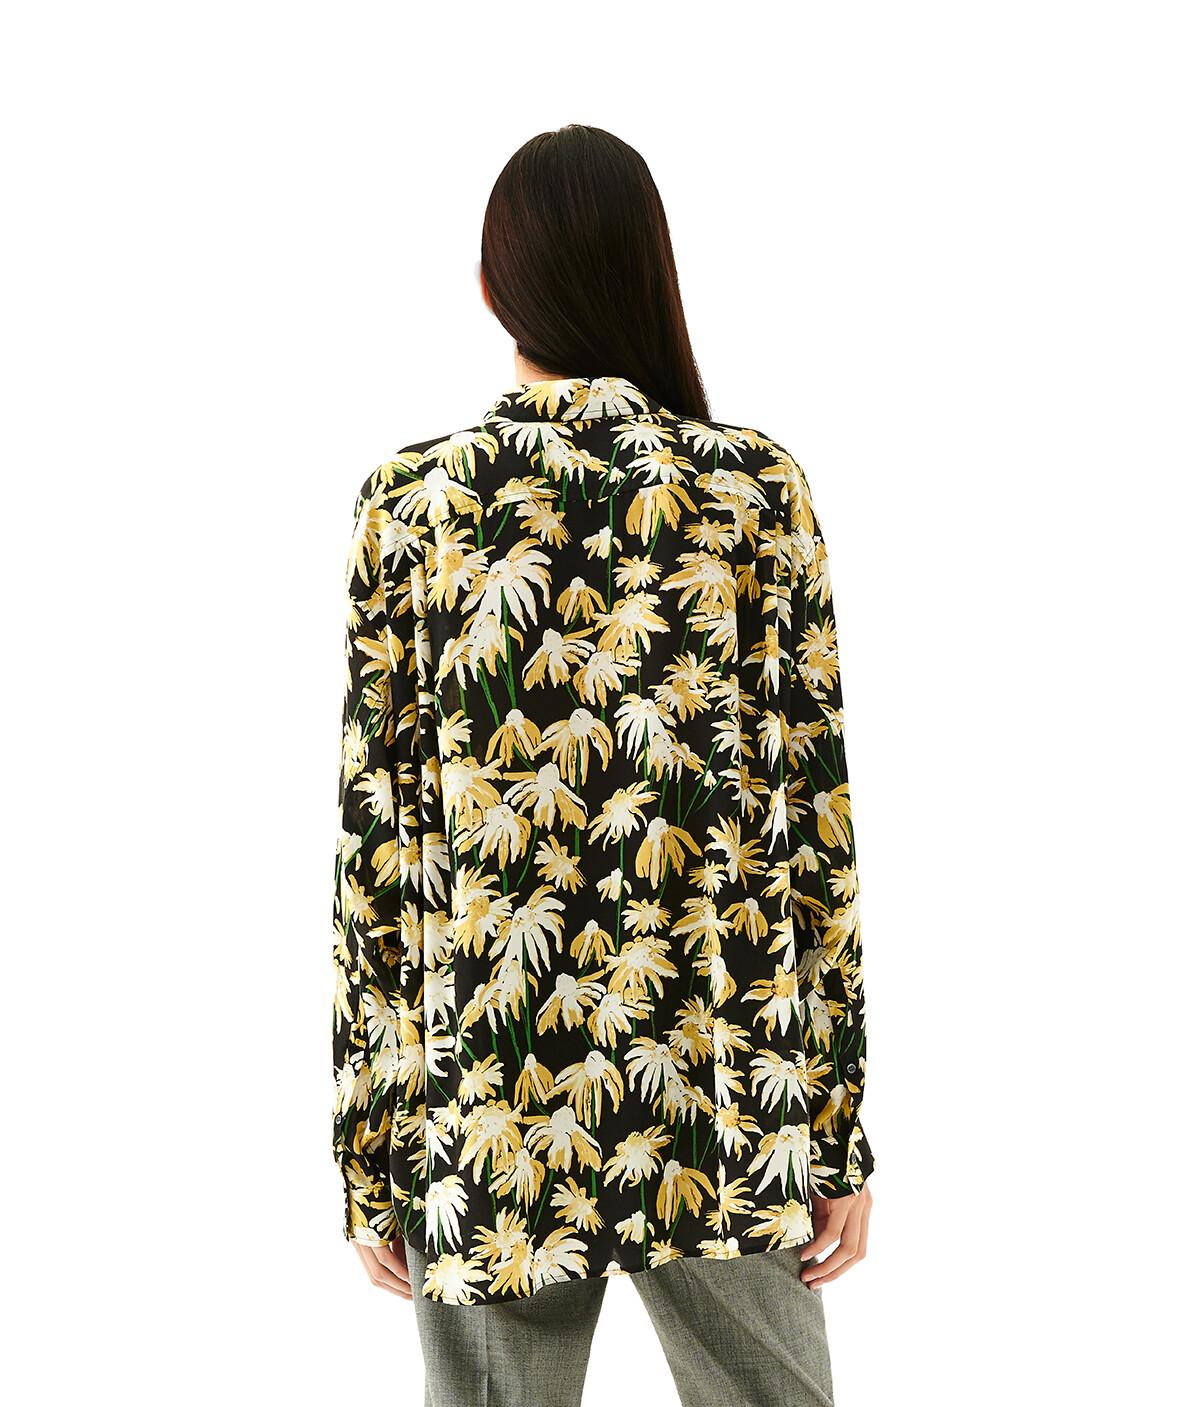 LOEWE Daisy Print Oversize Shirt Black/Yellow front